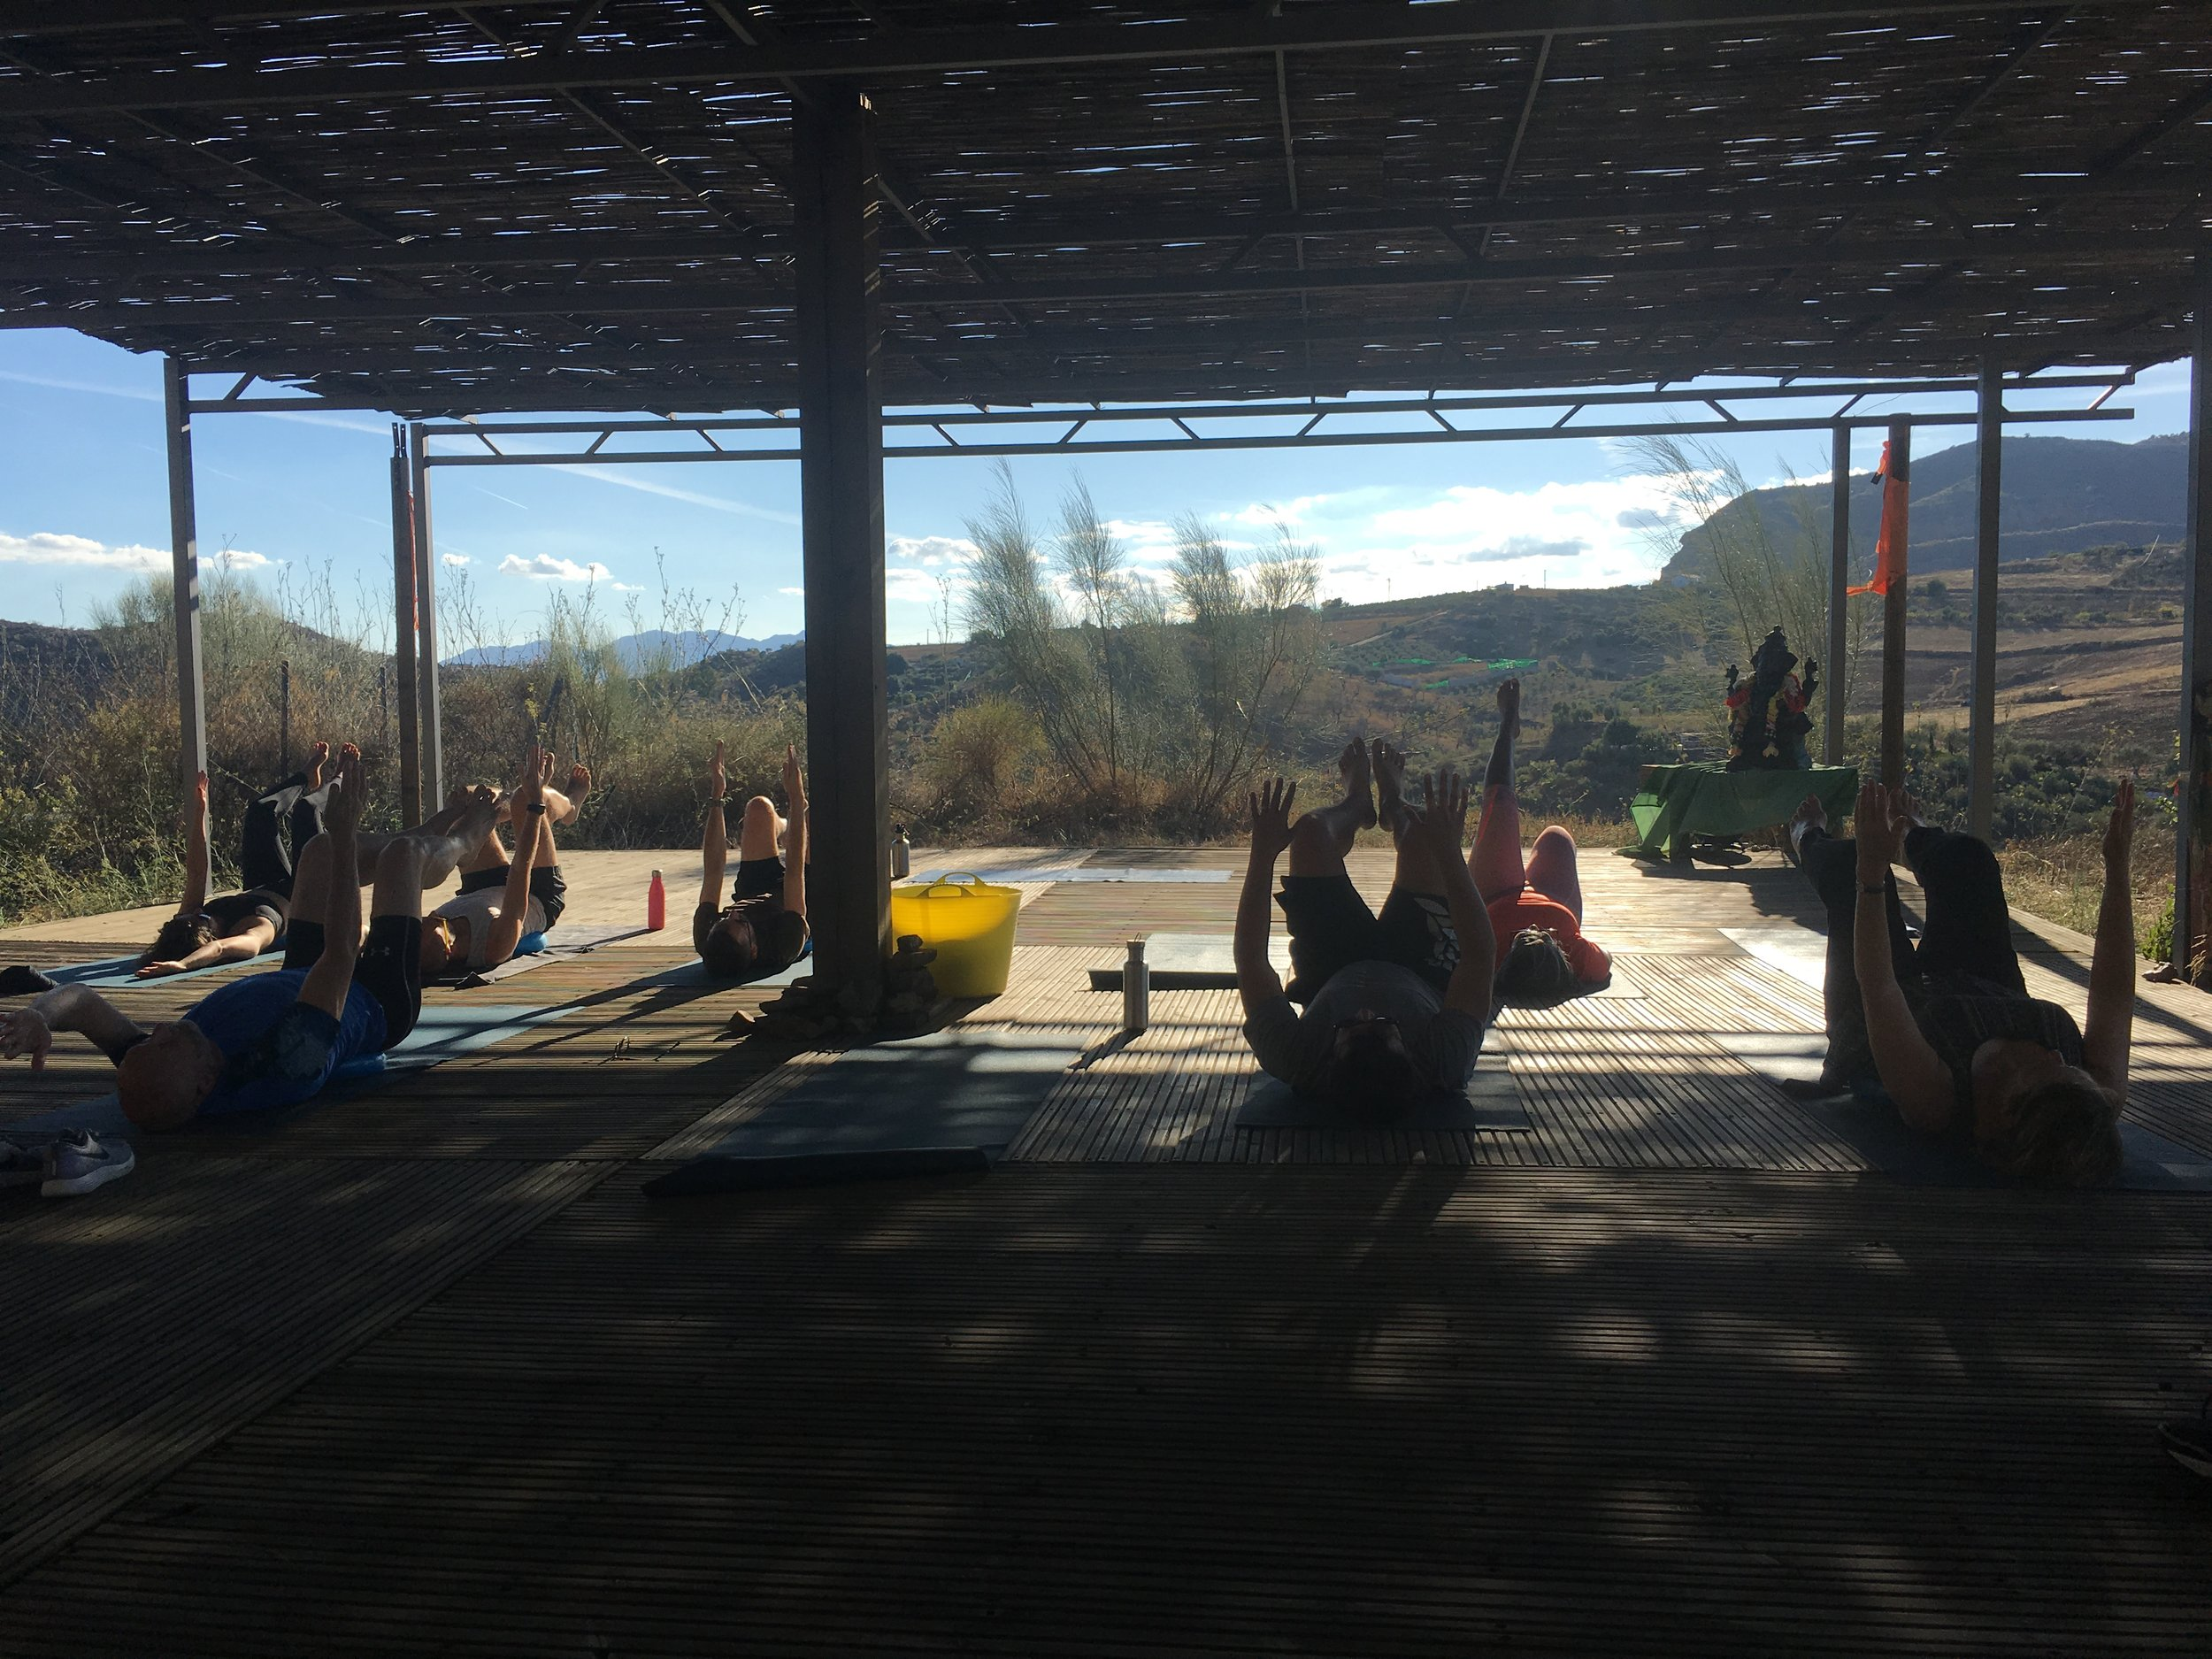 Yoga Deck at Valle De Vida